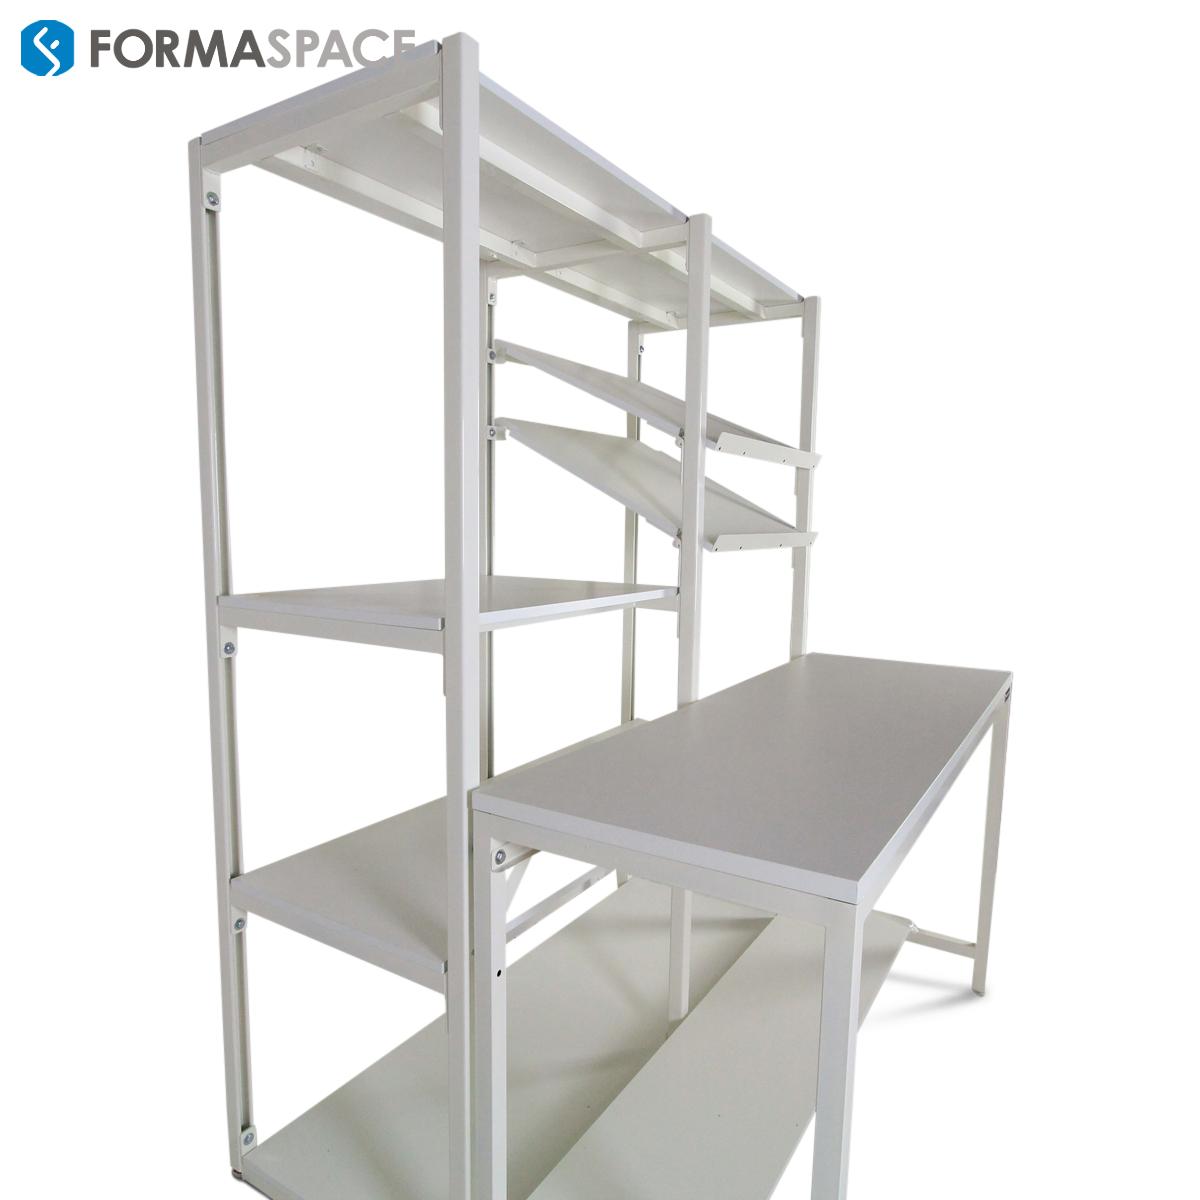 height adjustable industrial shelves